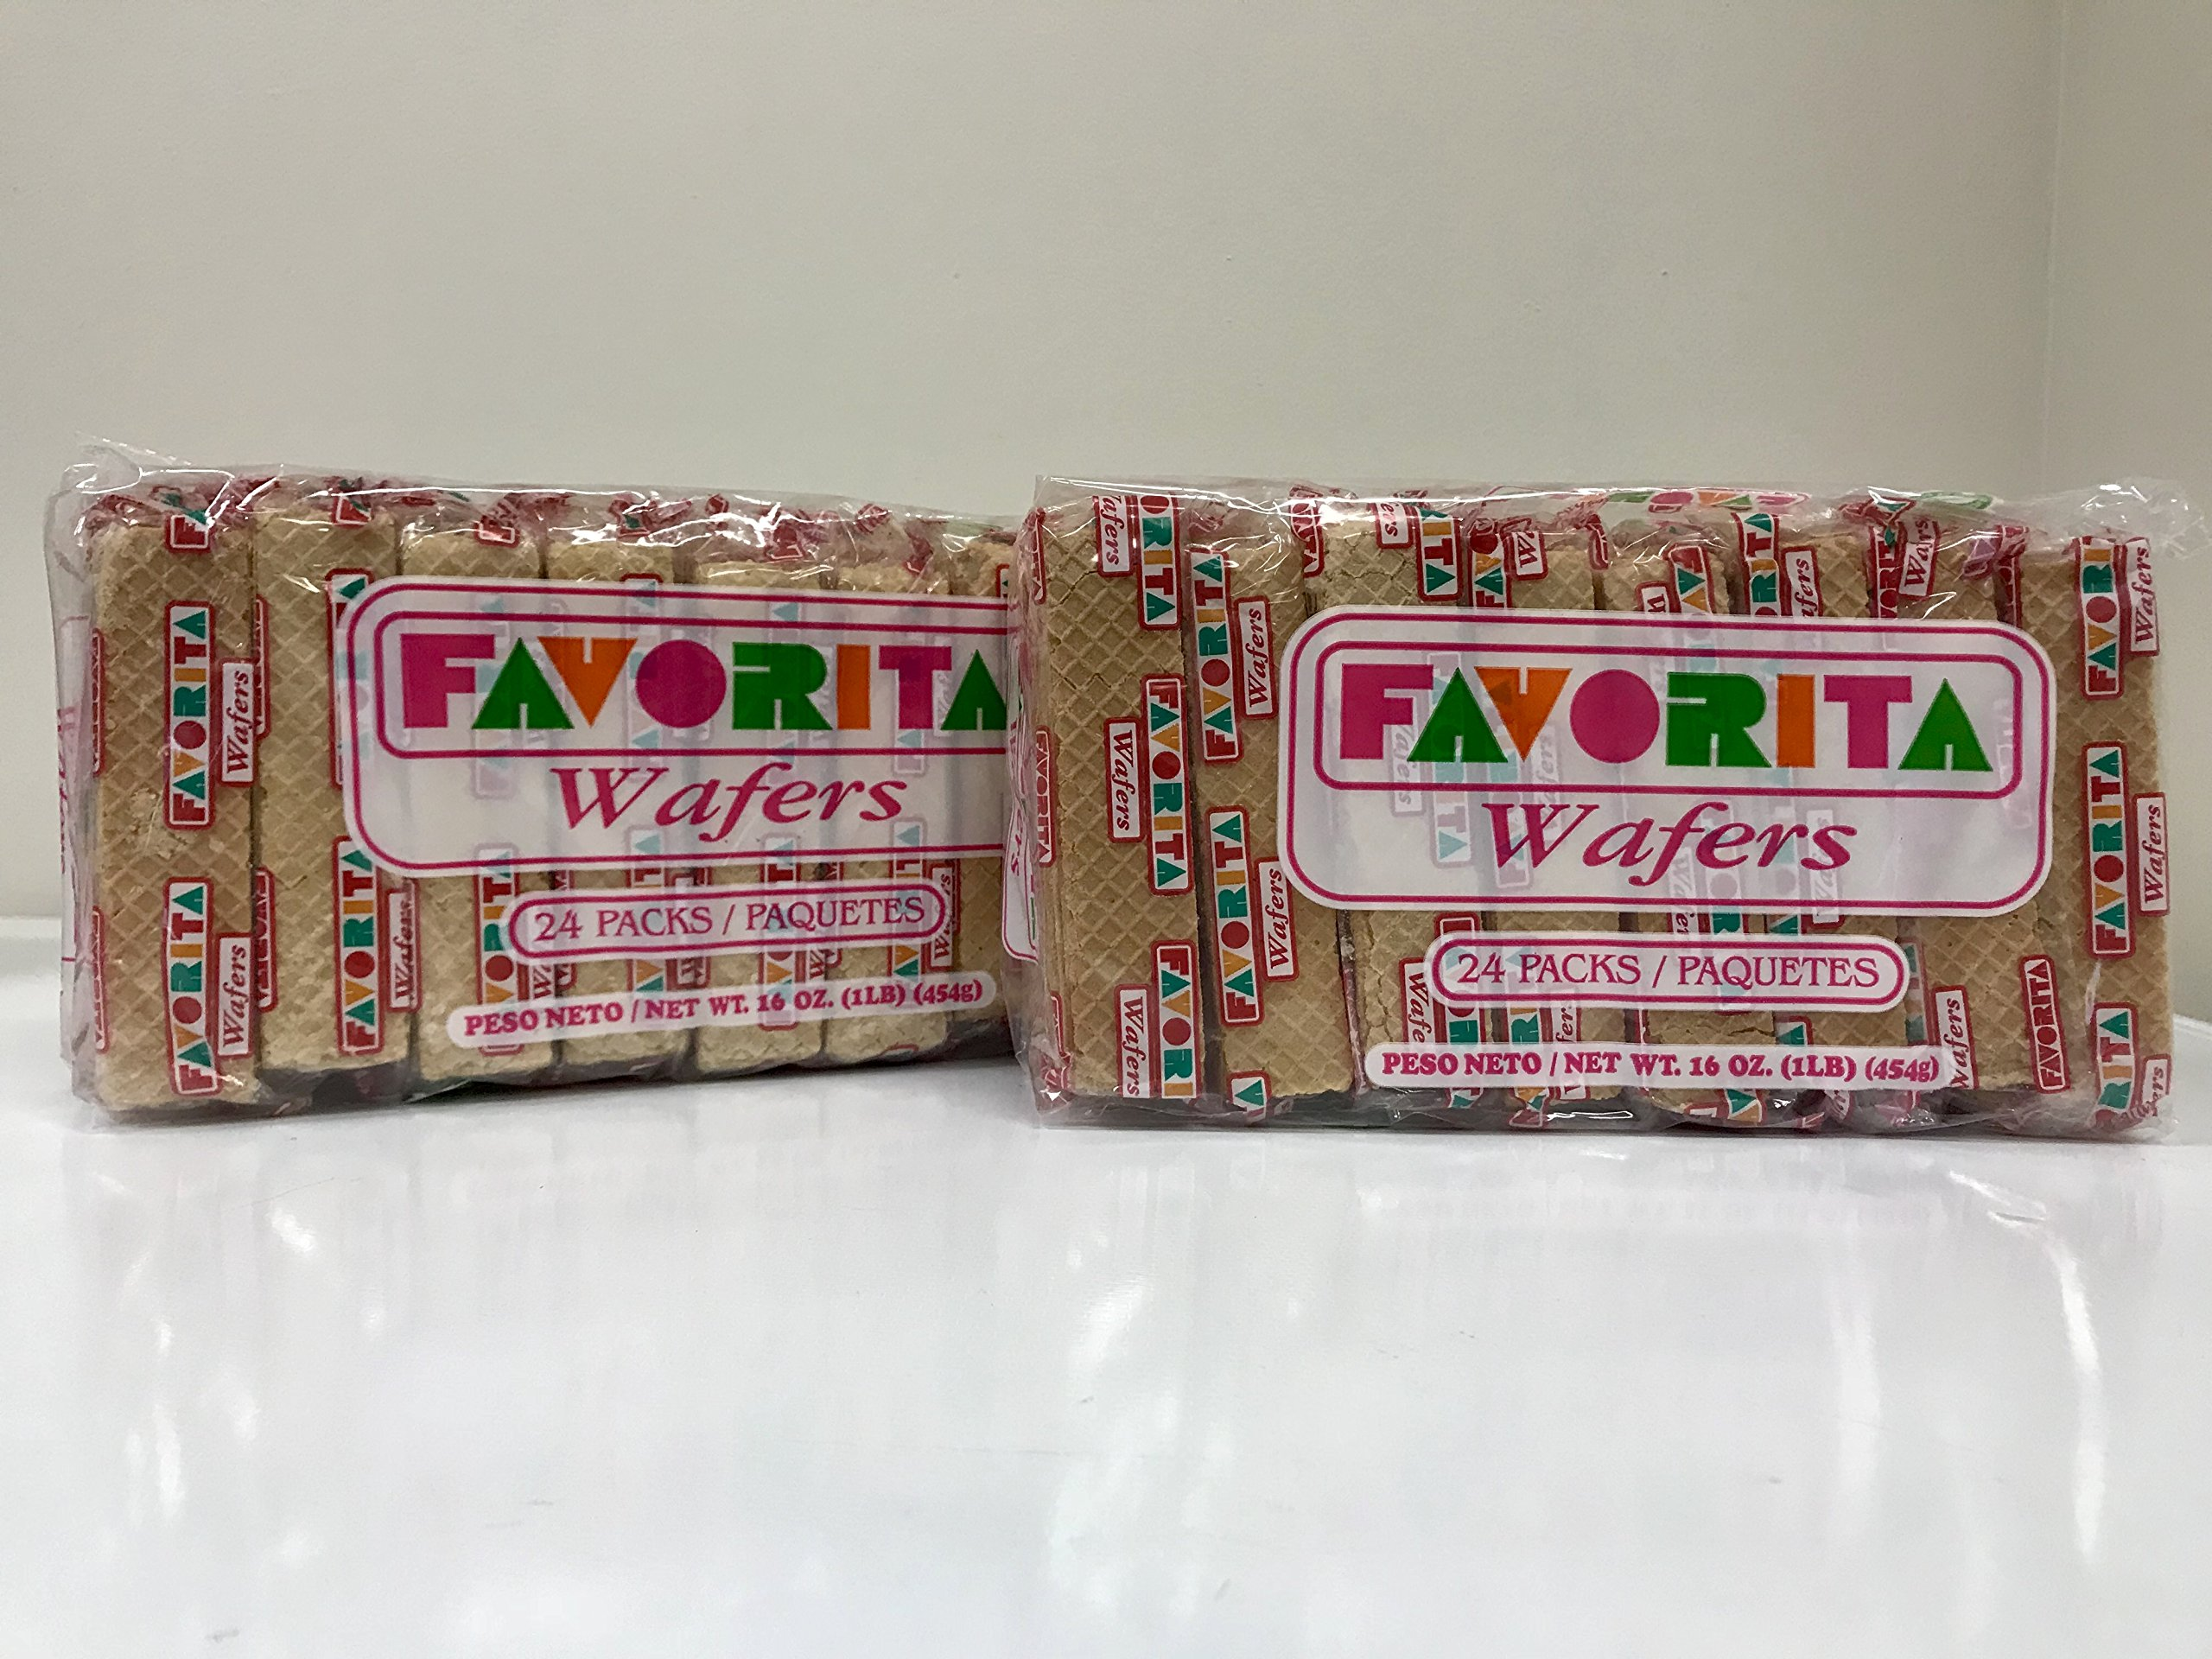 Favorita Wafers (Galletas Favorita) Puerto Rico's beloved wafer cookie - 16 oz (Count of 2)